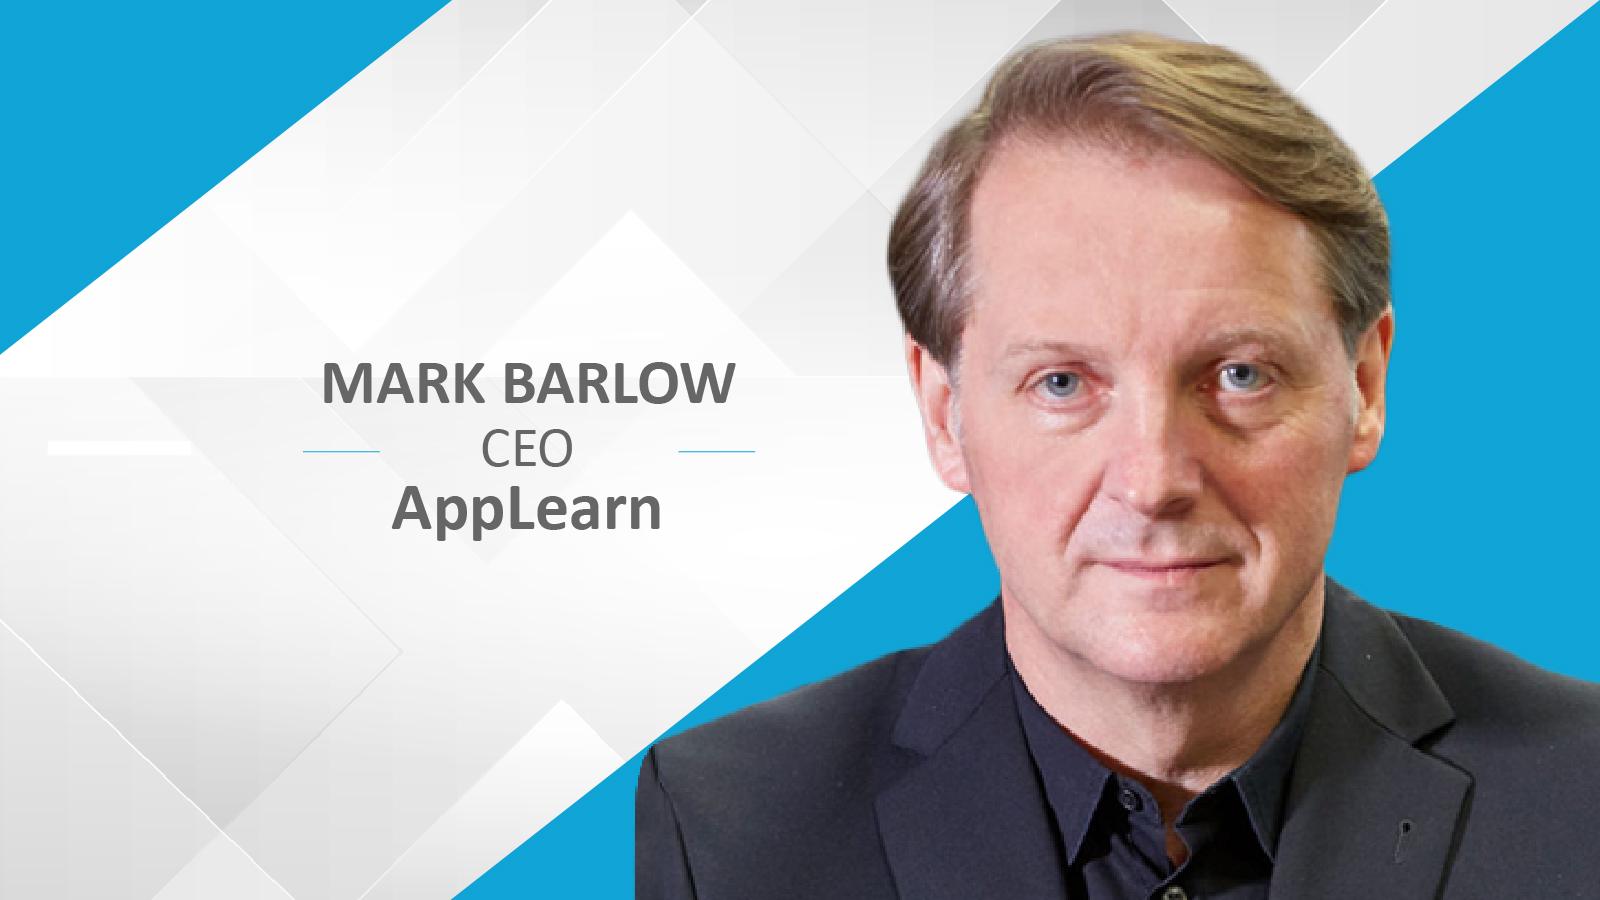 MARK BARLOW-